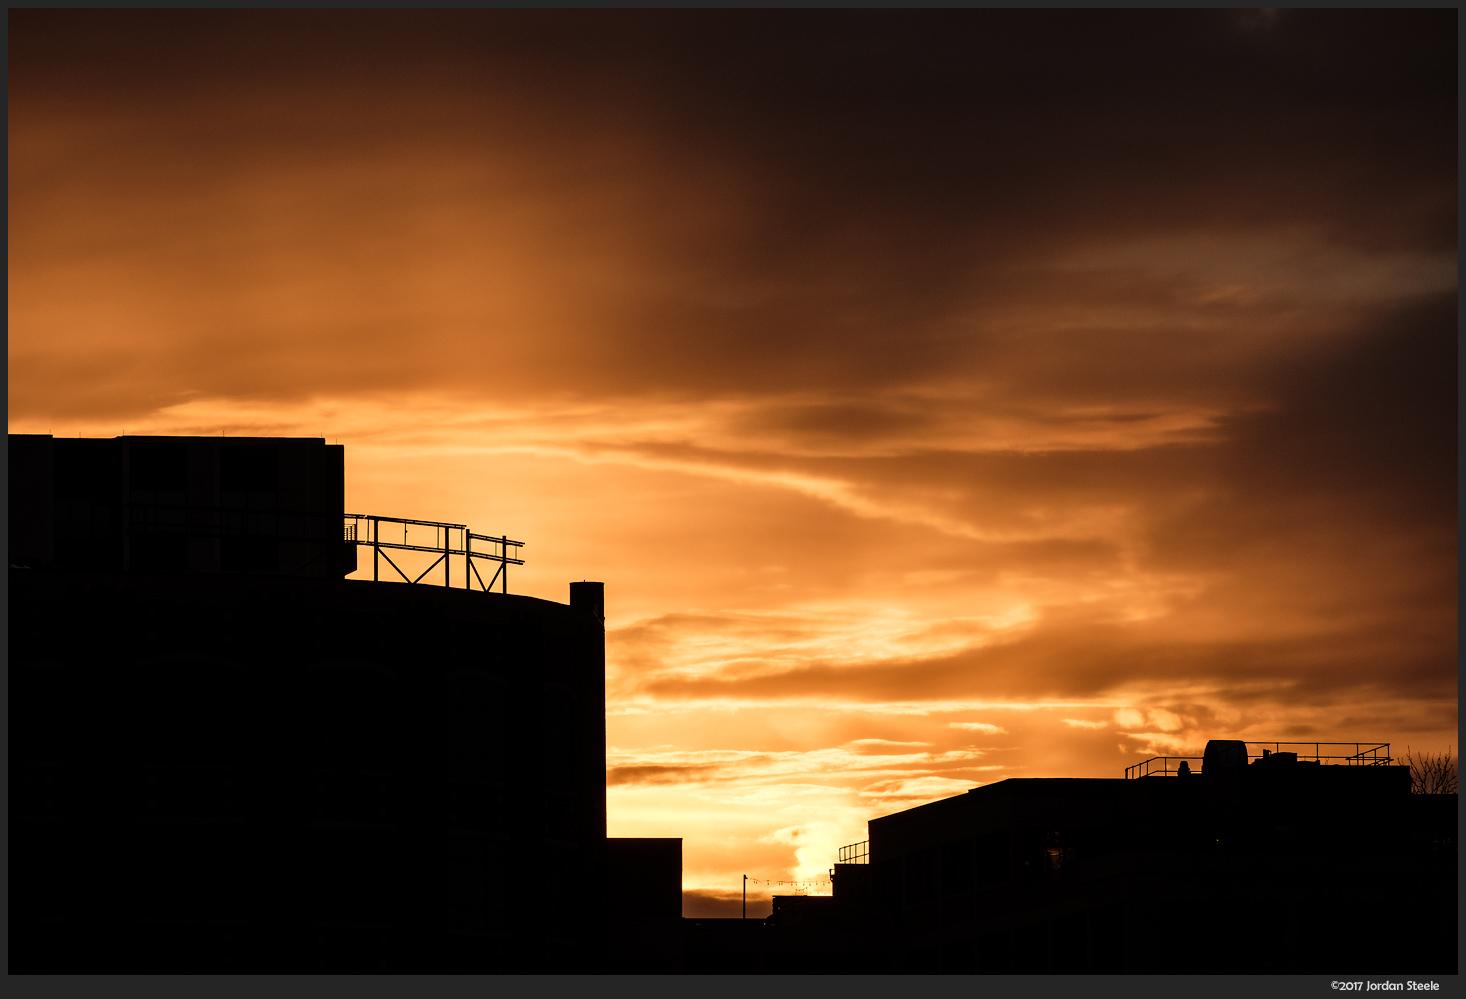 Sunrise Silhouette - Fujifilm X-T20 with Fujinon XF 55-200mm f/3.5-4.8 @